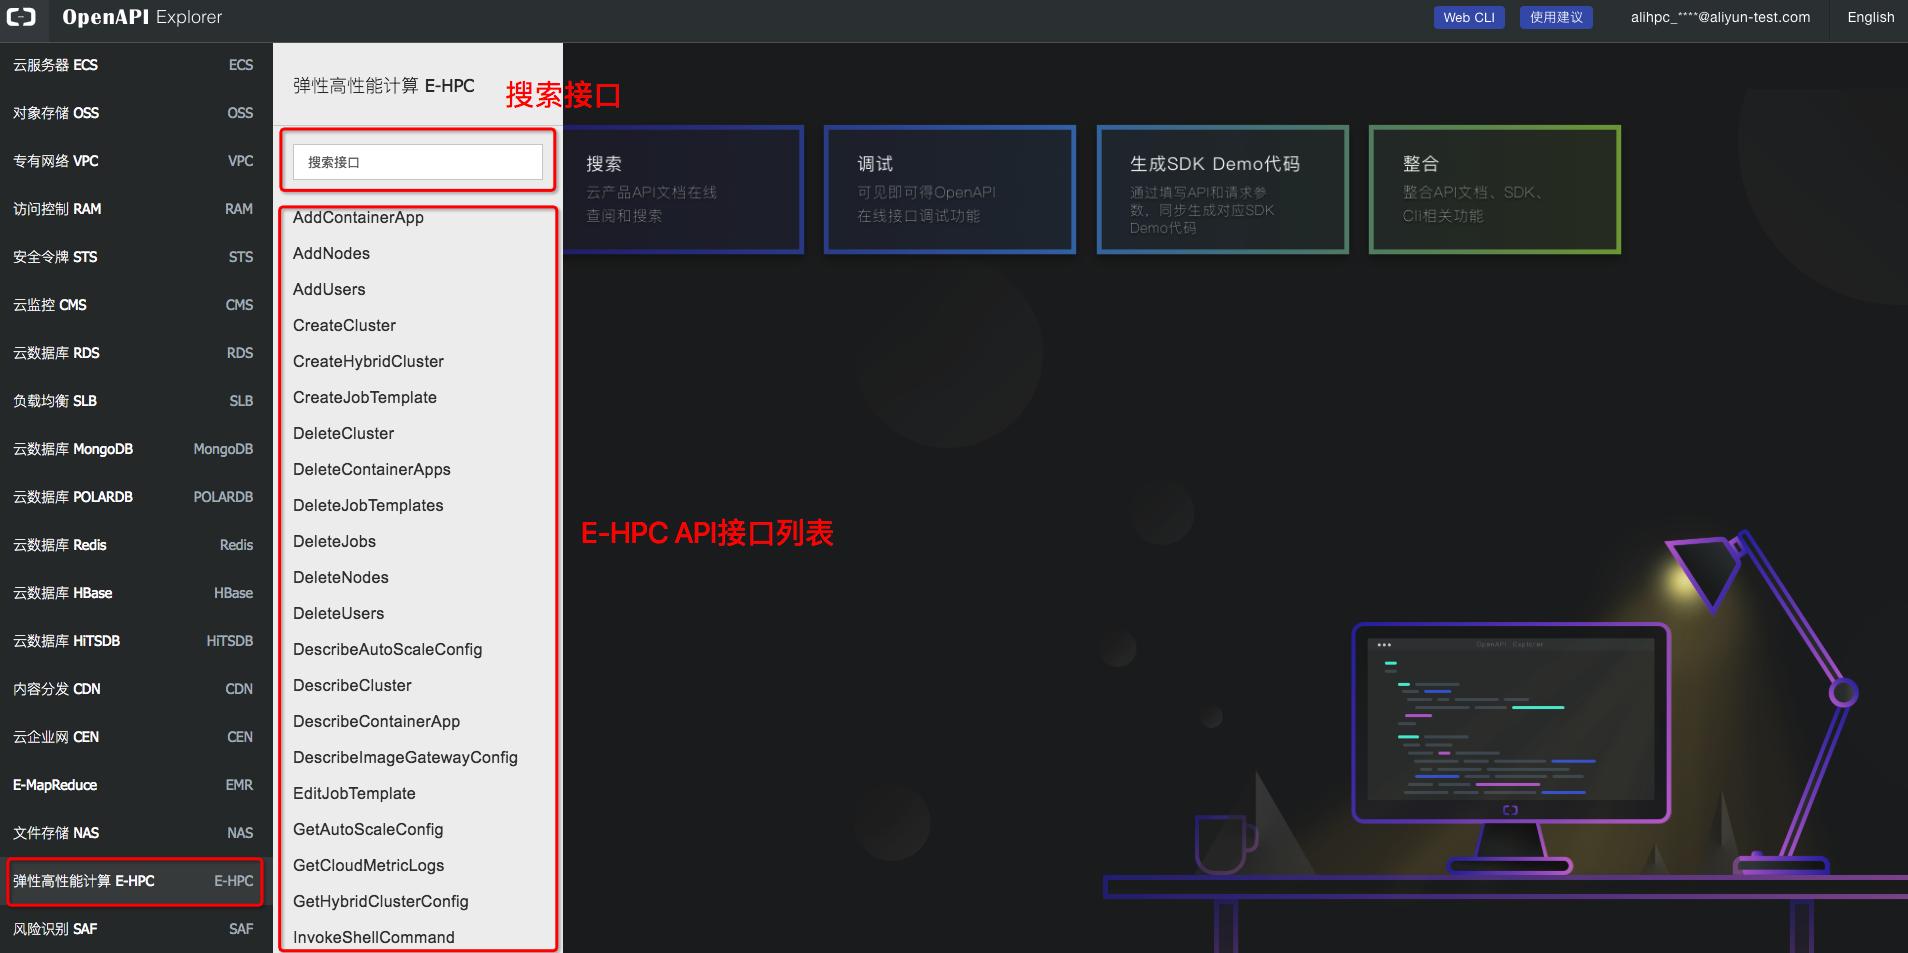 API搜索界面